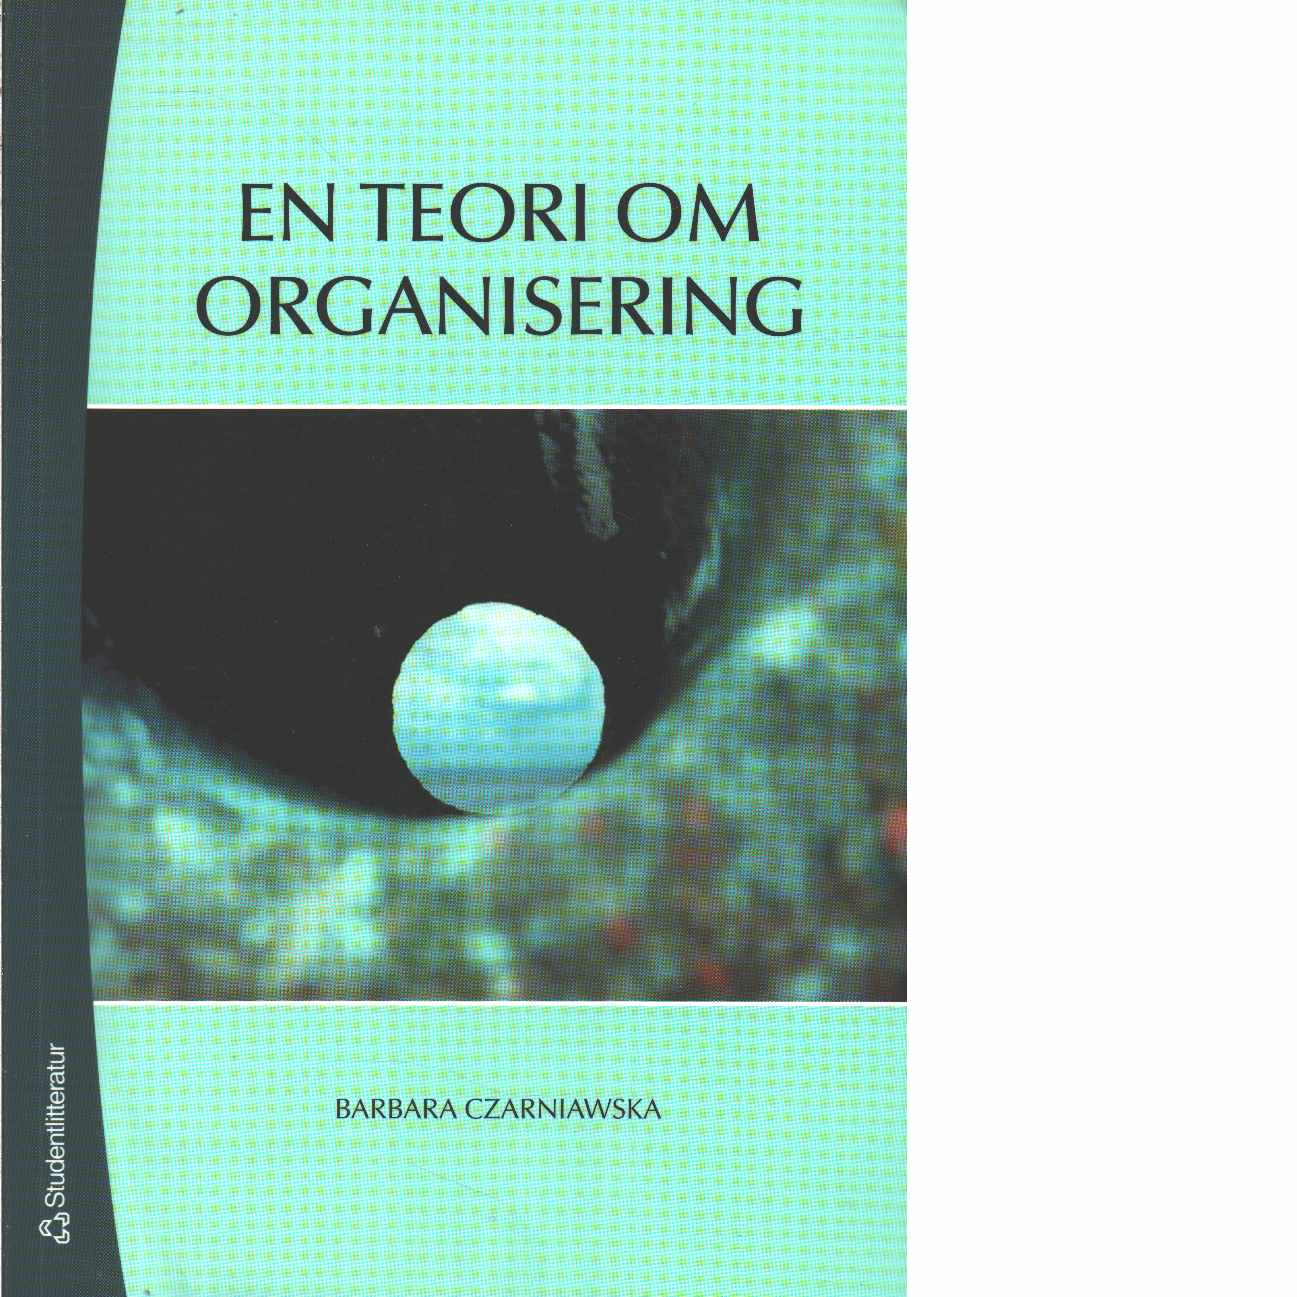 En teori om organisering - Czarniawska, Barbara